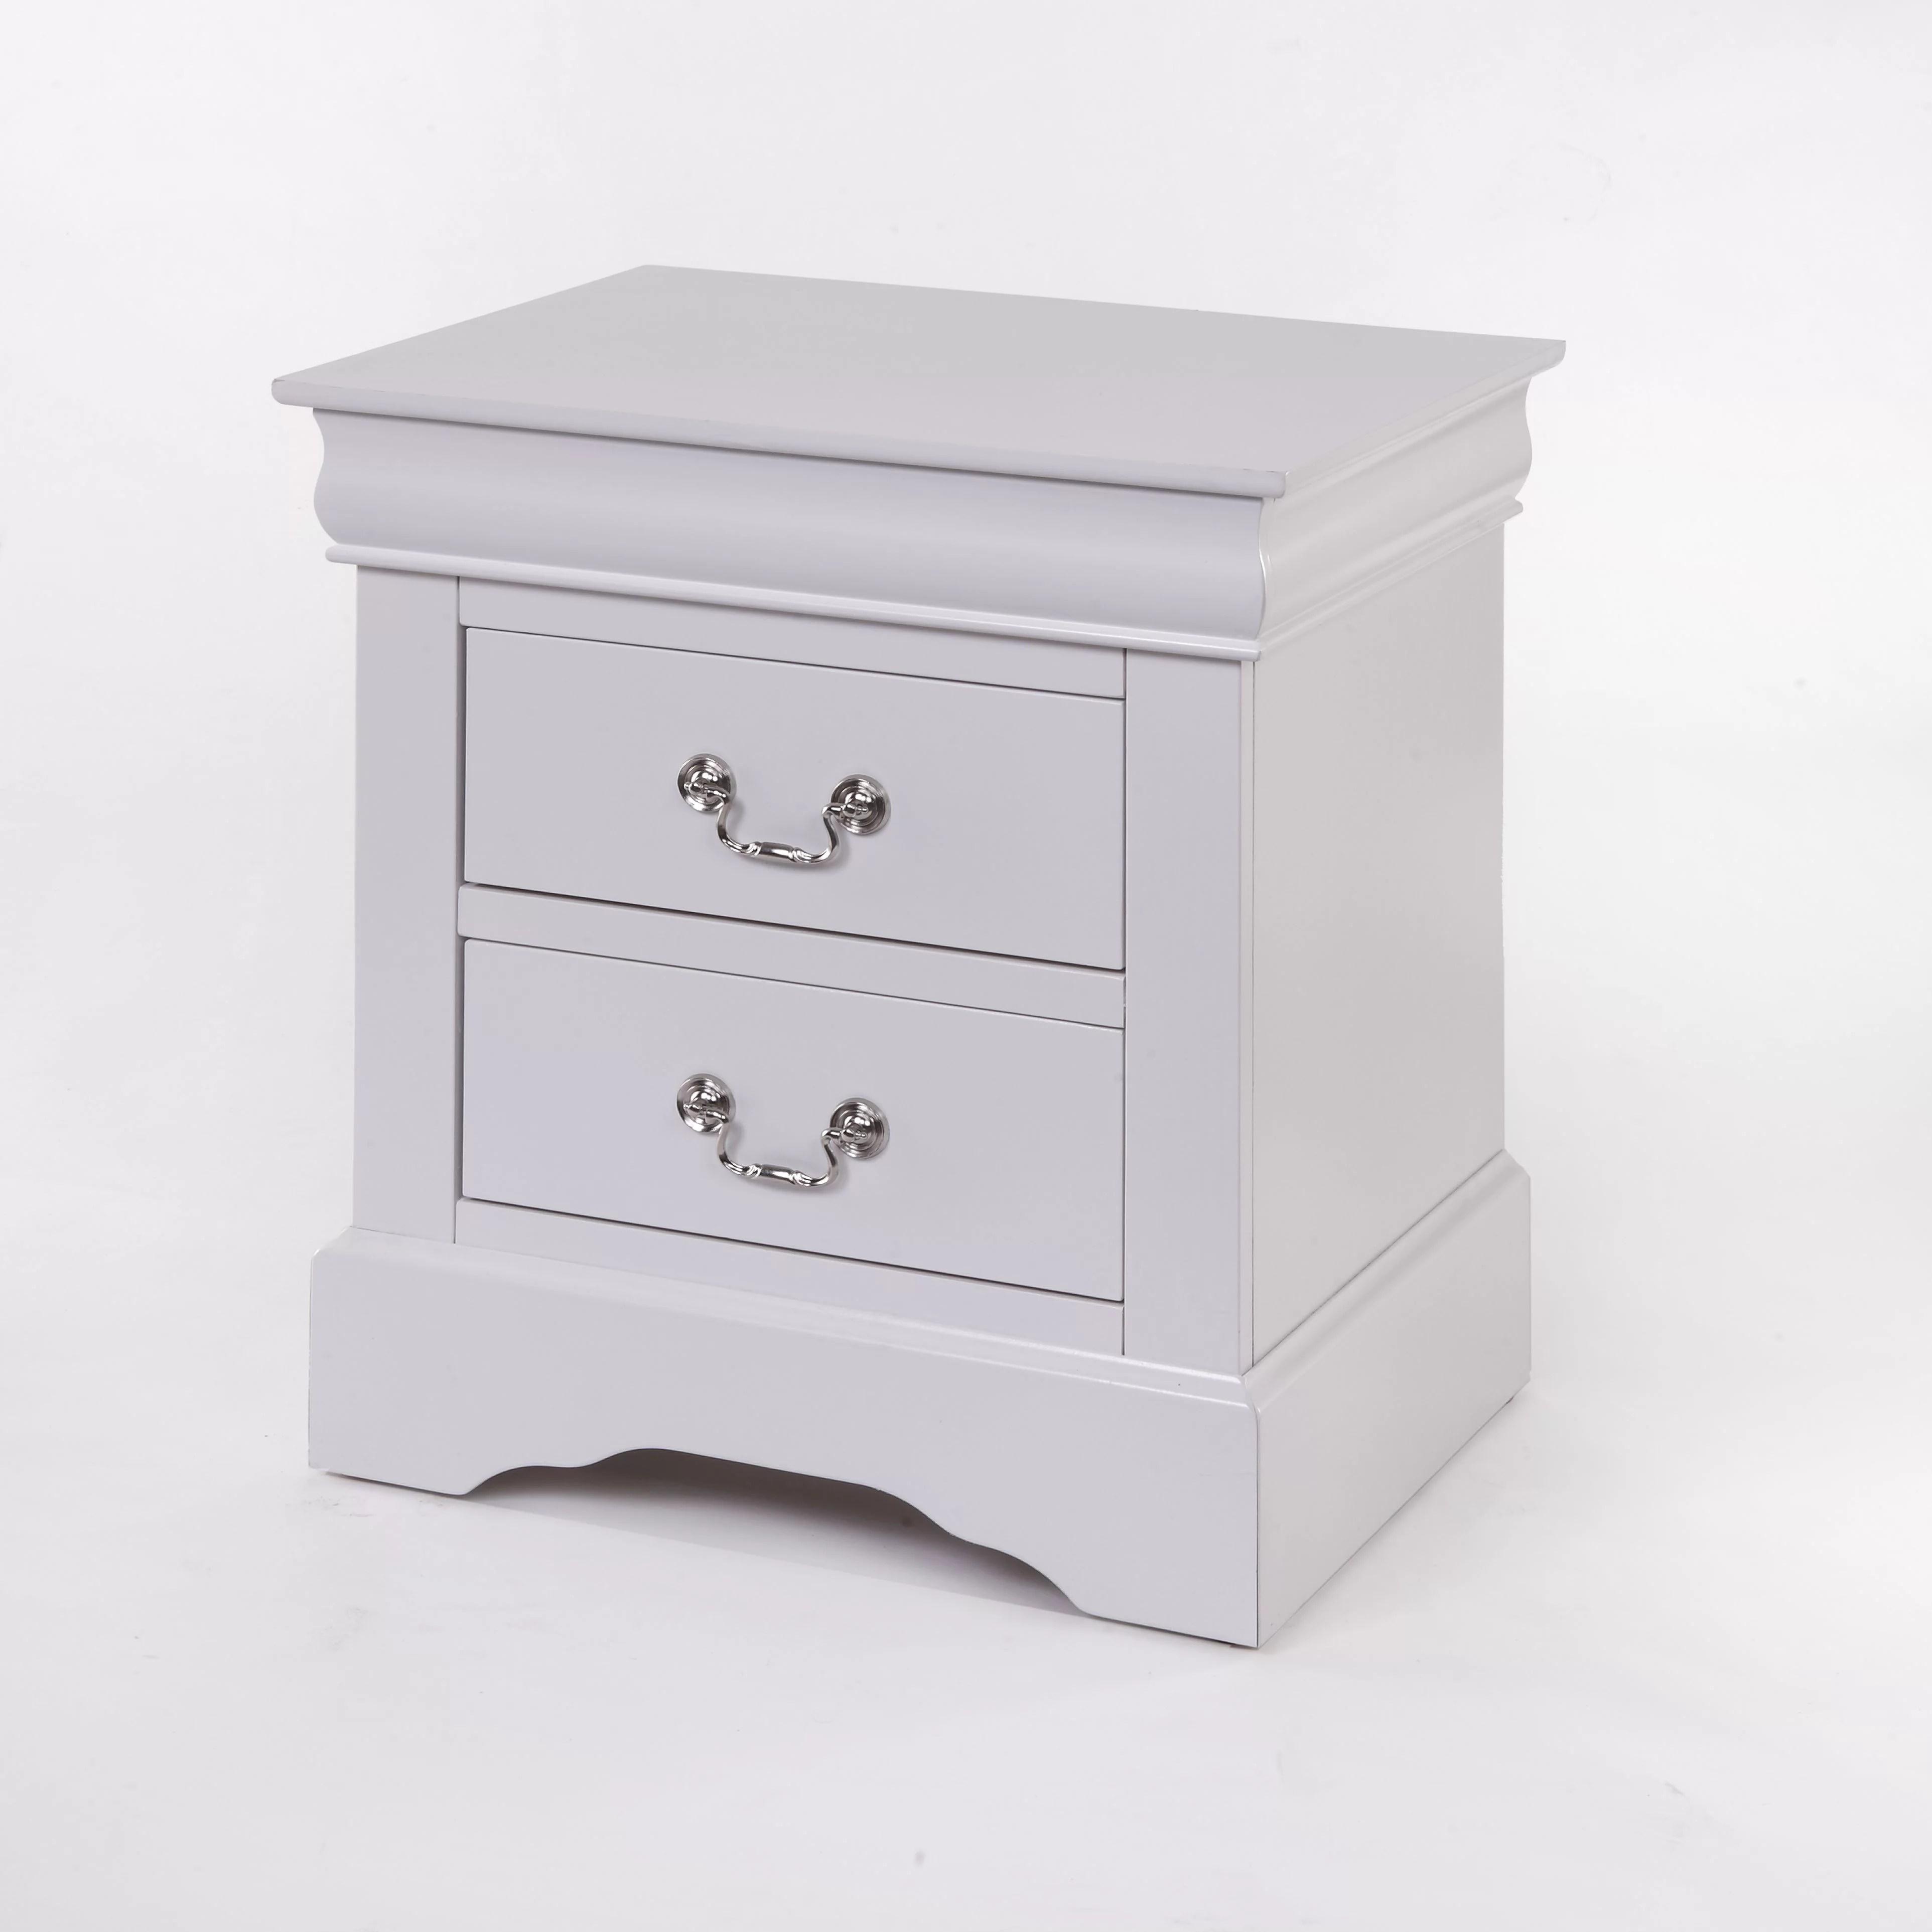 acme furniture louis phillipe iii 2 drawer nightstand white